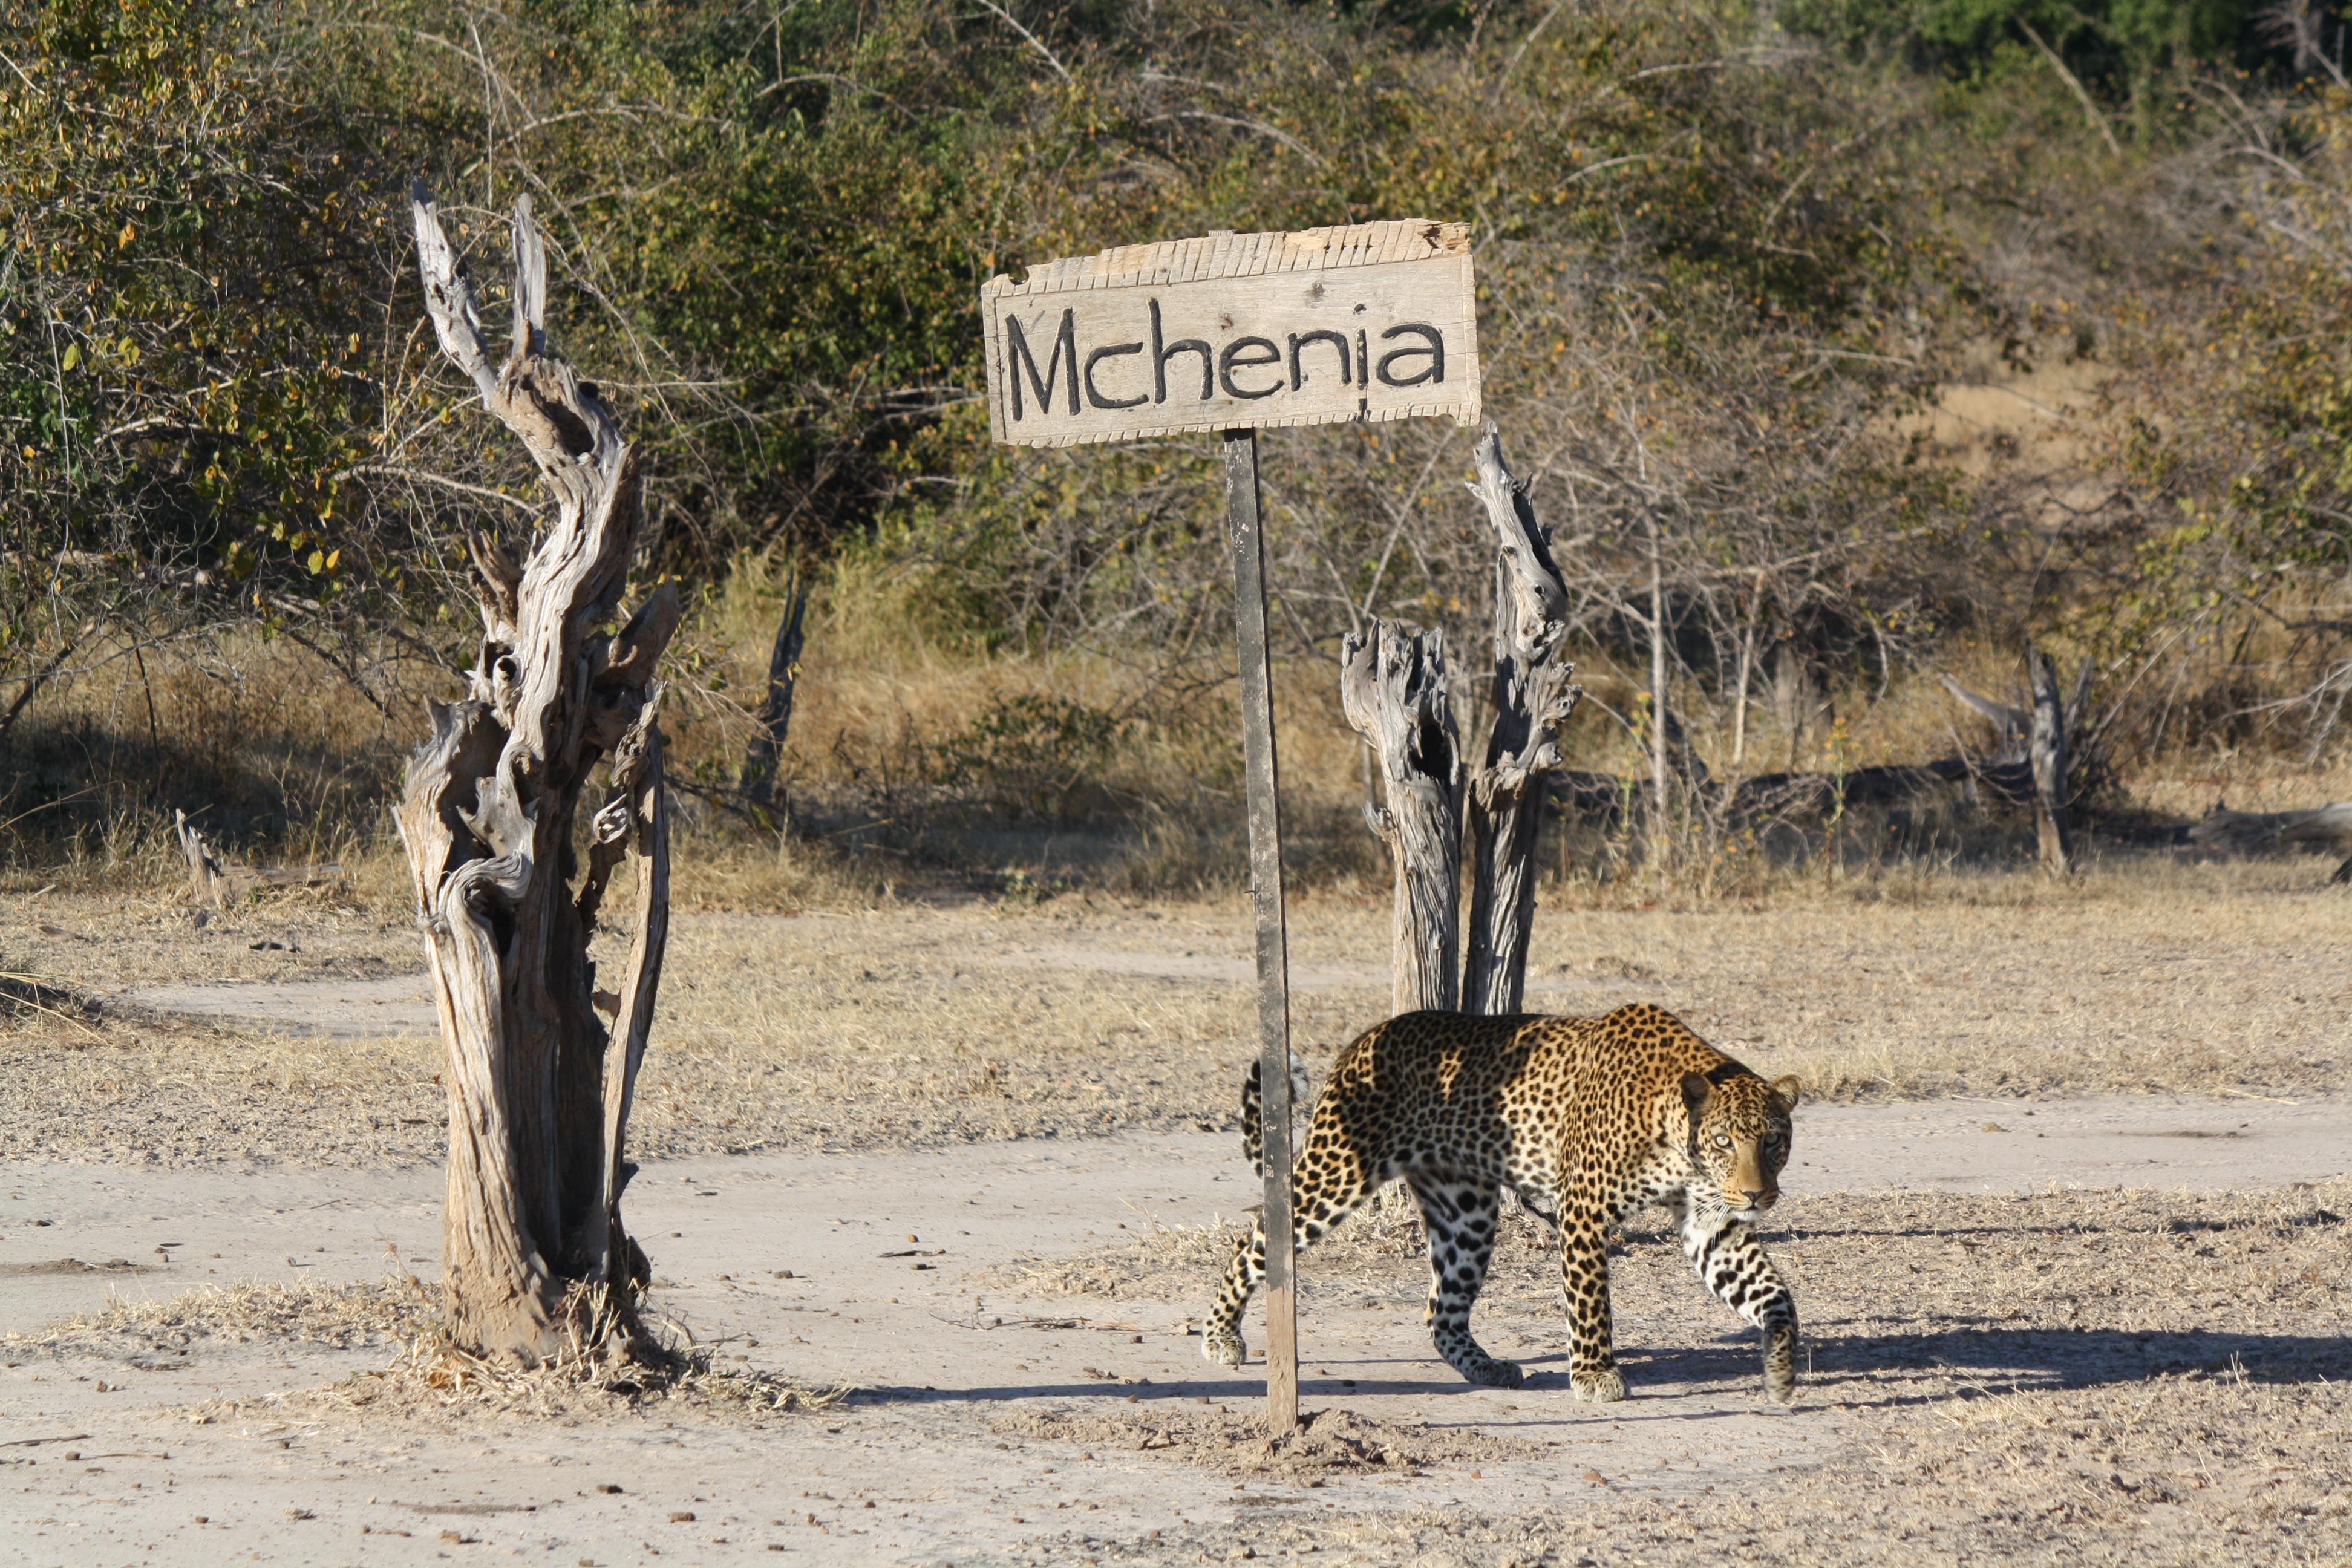 Zambia,-Mchenja-Camp-exterior